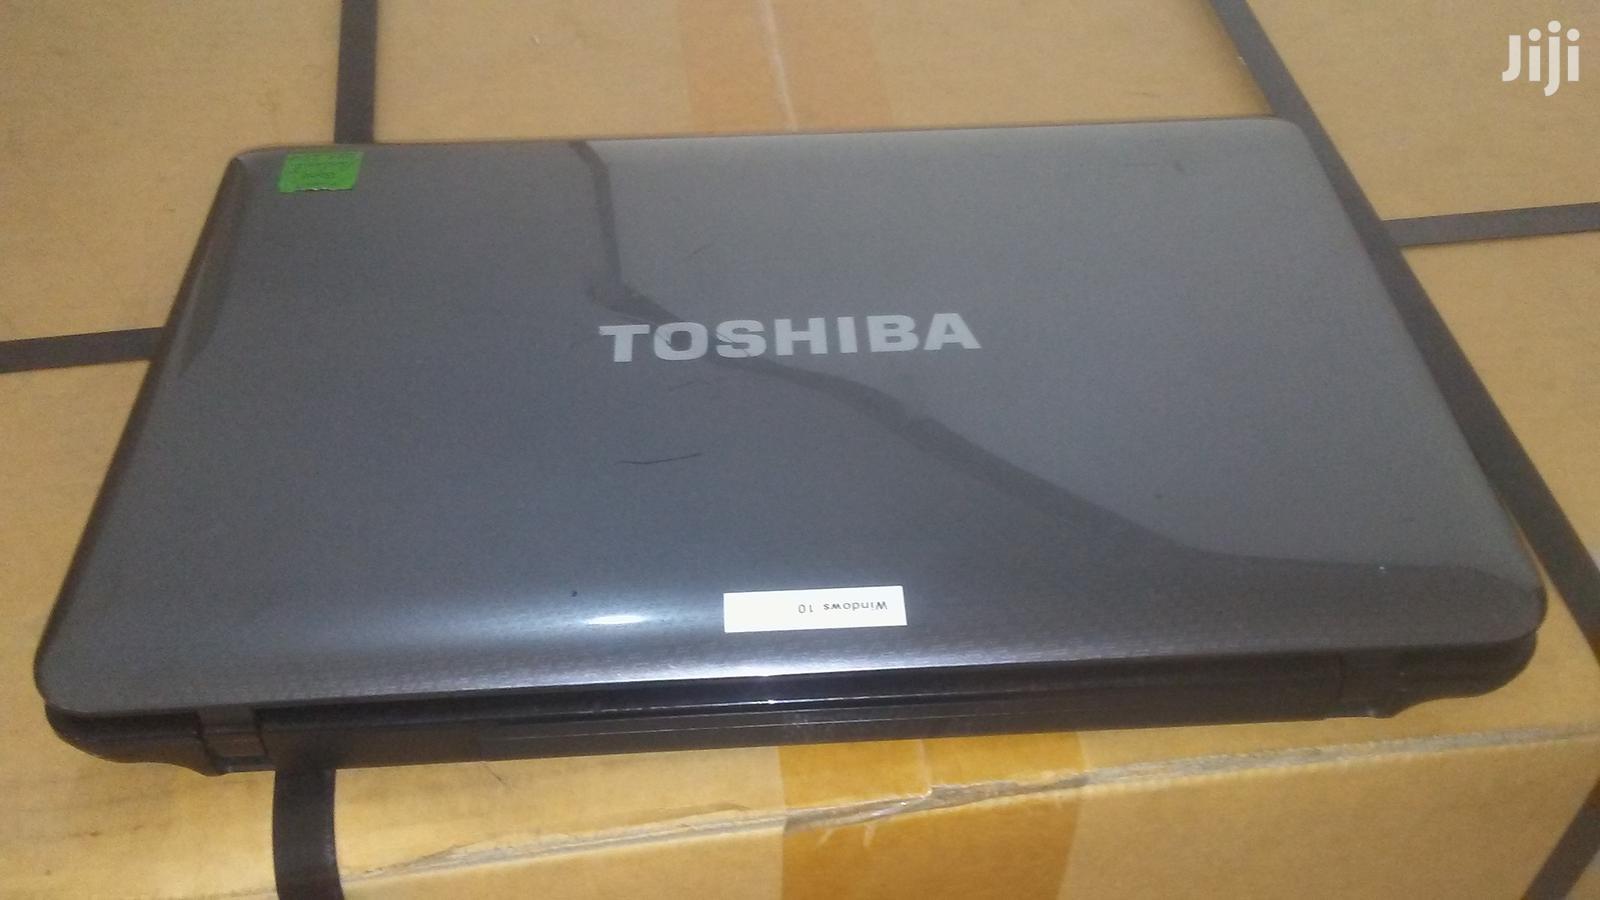 Laptop Toshiba Satellite L555 3GB Intel Pentium HDD 320GB   Laptops & Computers for sale in Ikeja, Lagos State, Nigeria